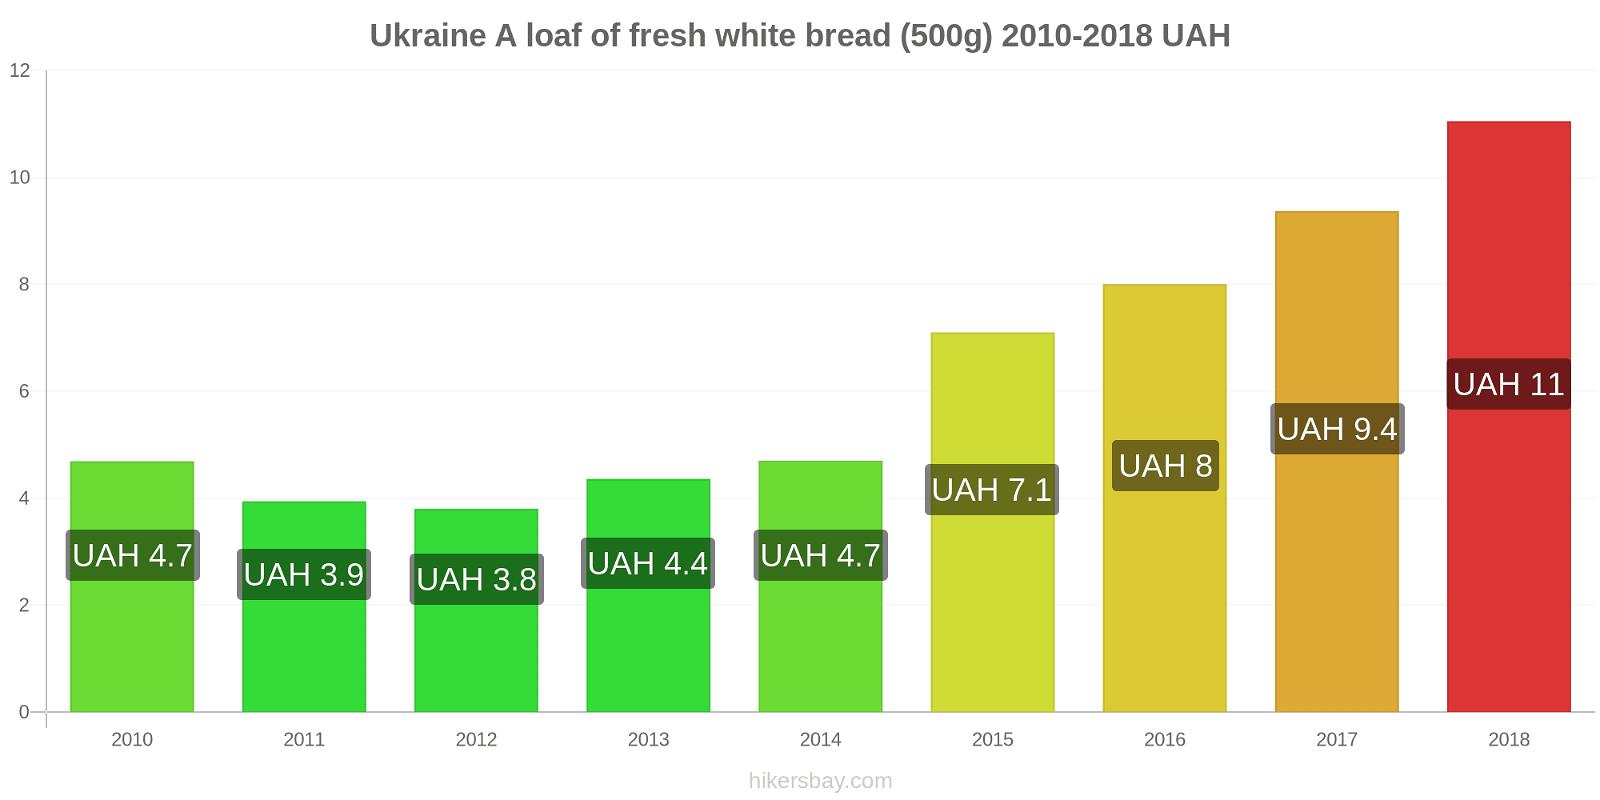 Ukraine price changes A loaf of fresh white bread (500g) hikersbay.com